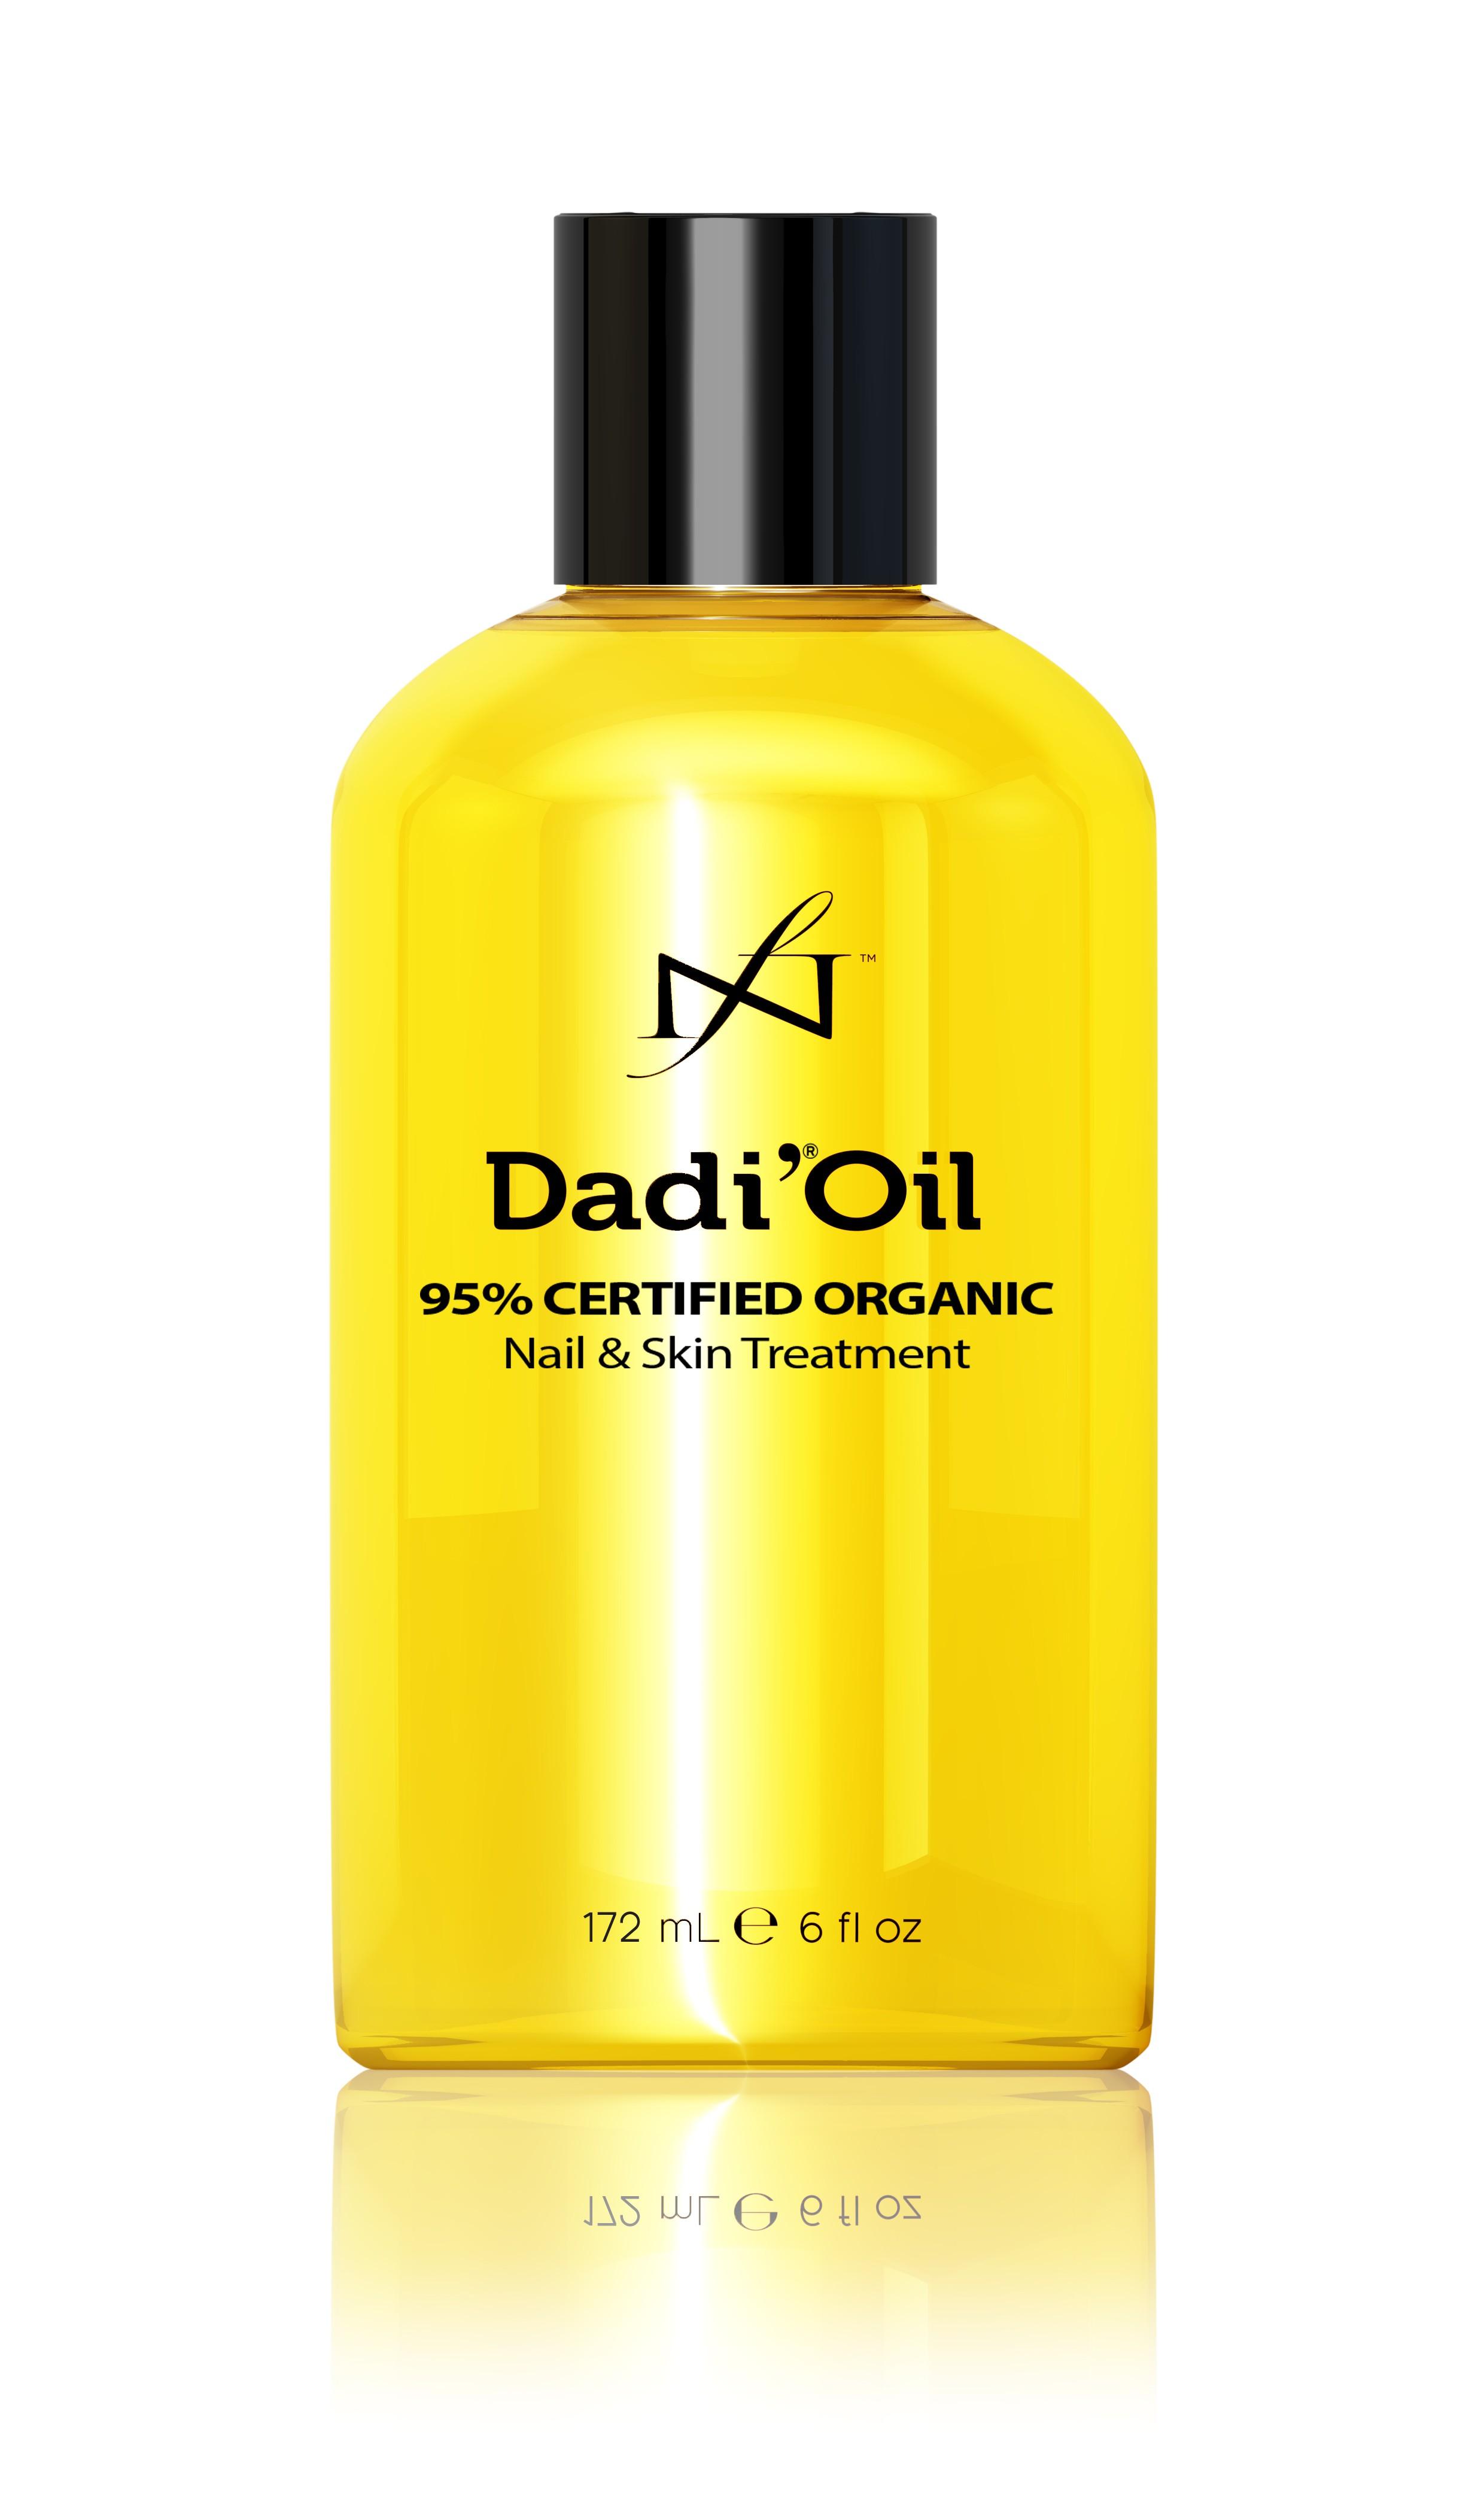 Dadi'Oil 172ml